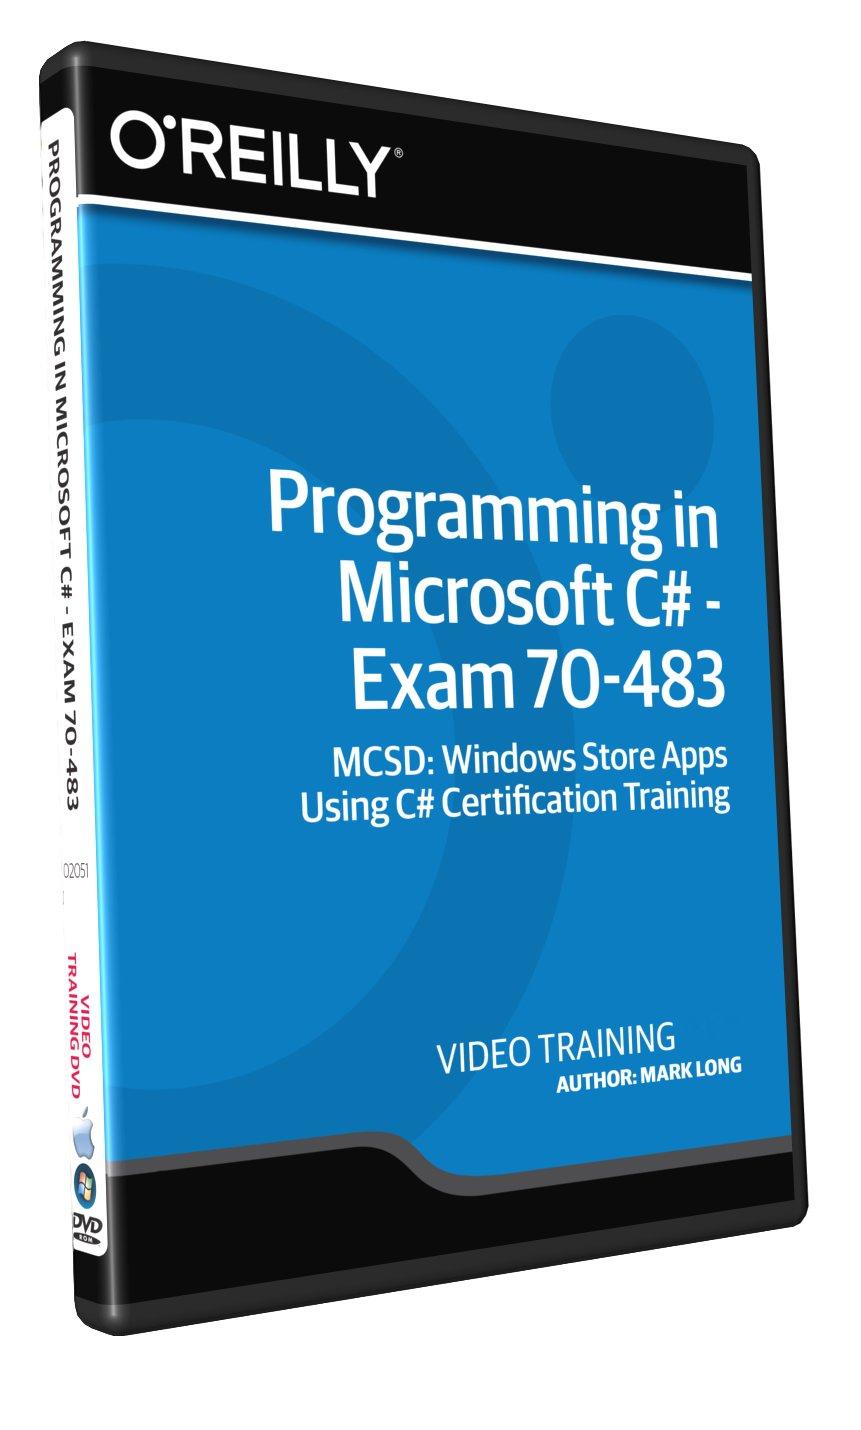 Amazon programming in microsoft c exam 70 483 training dvd xflitez Gallery